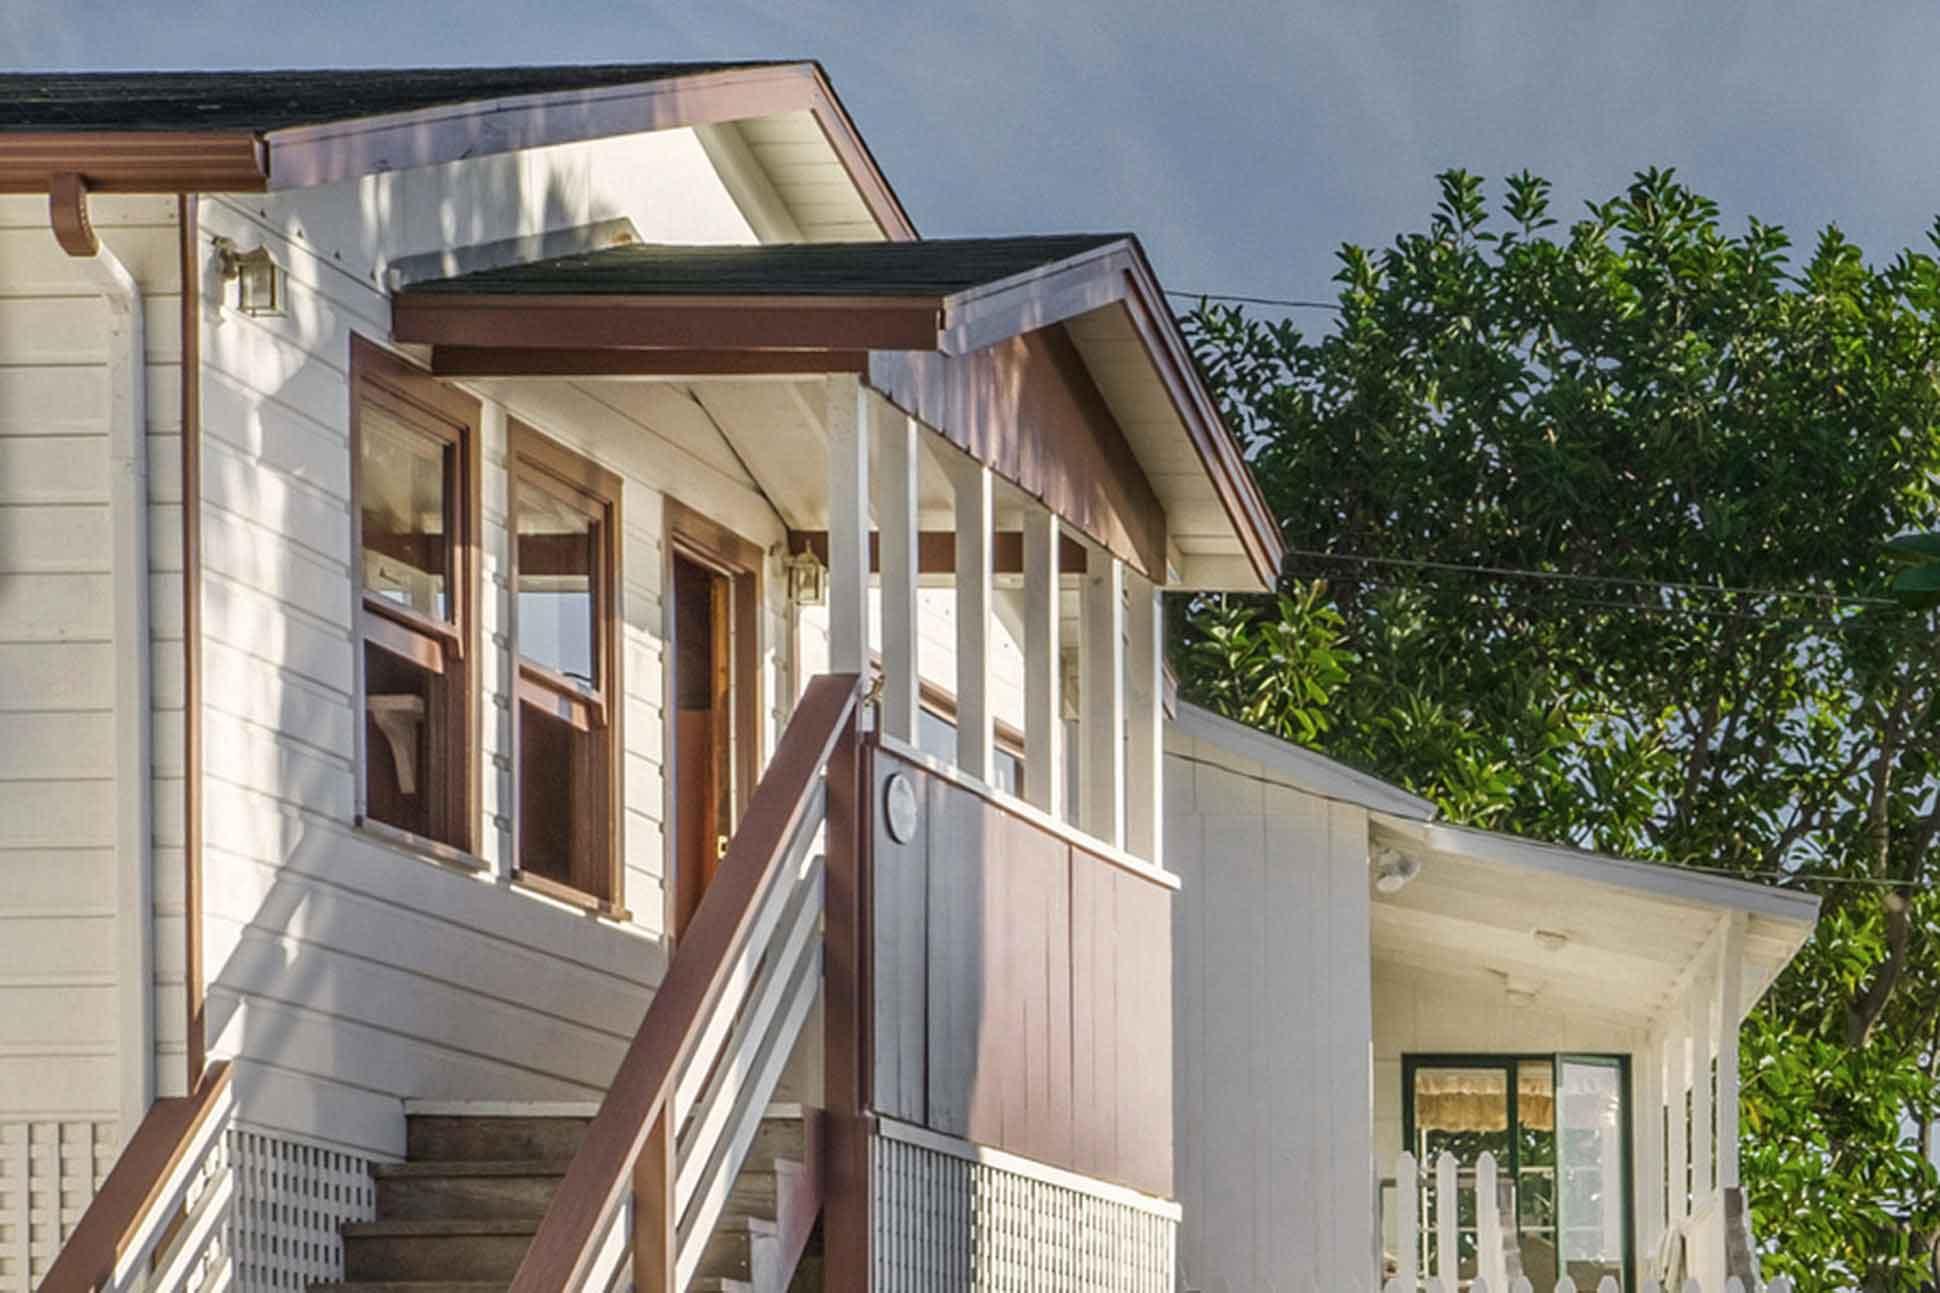 Crystal Cove Cottages, Newport Coast, California, USA